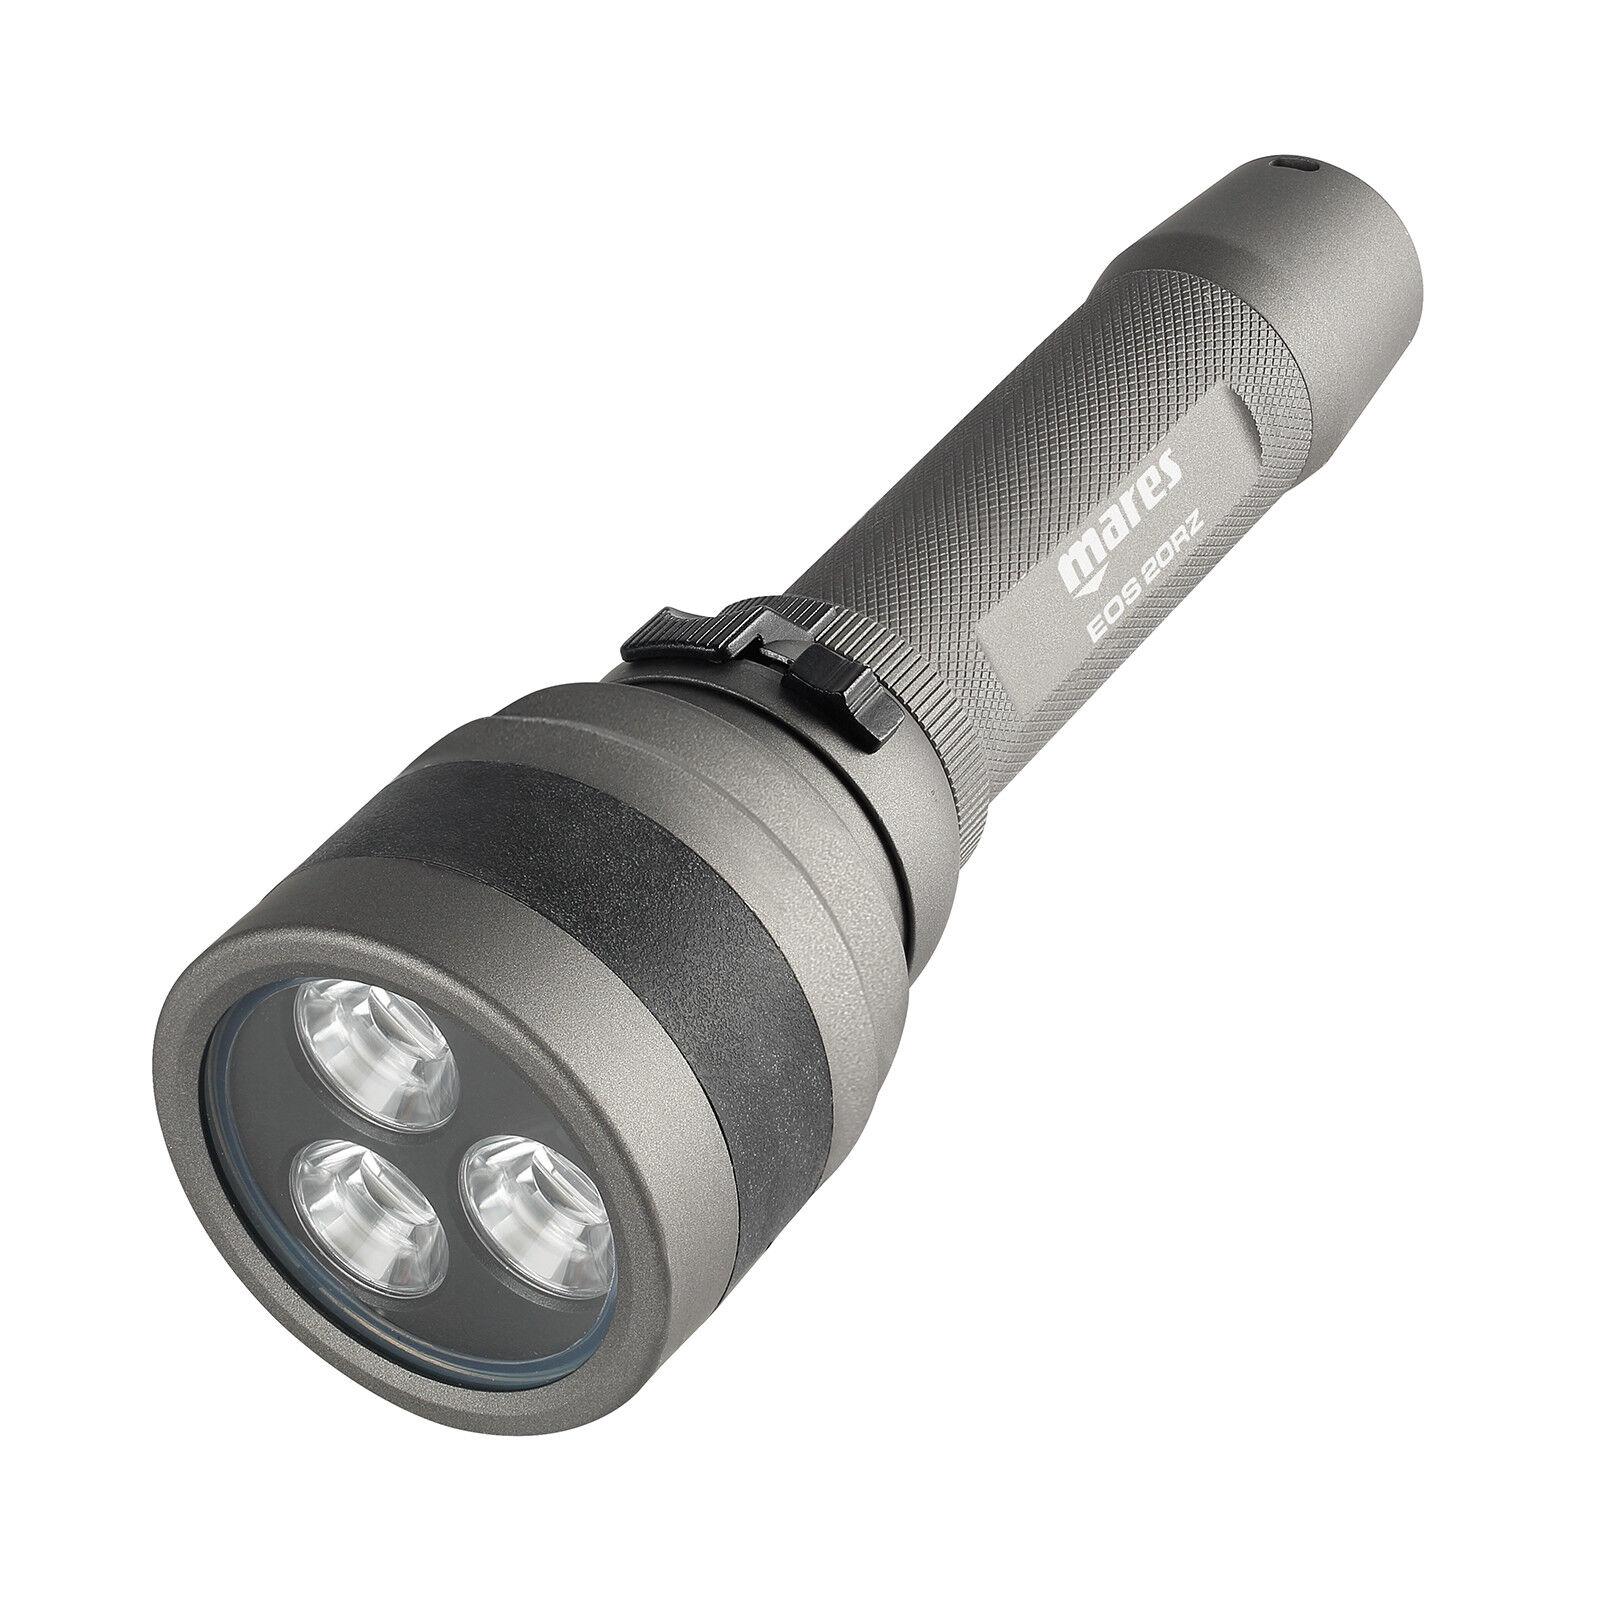 Mares EOS 20RZ 20RZ 20RZ Tauchlampe 2300 Lumen 749c93